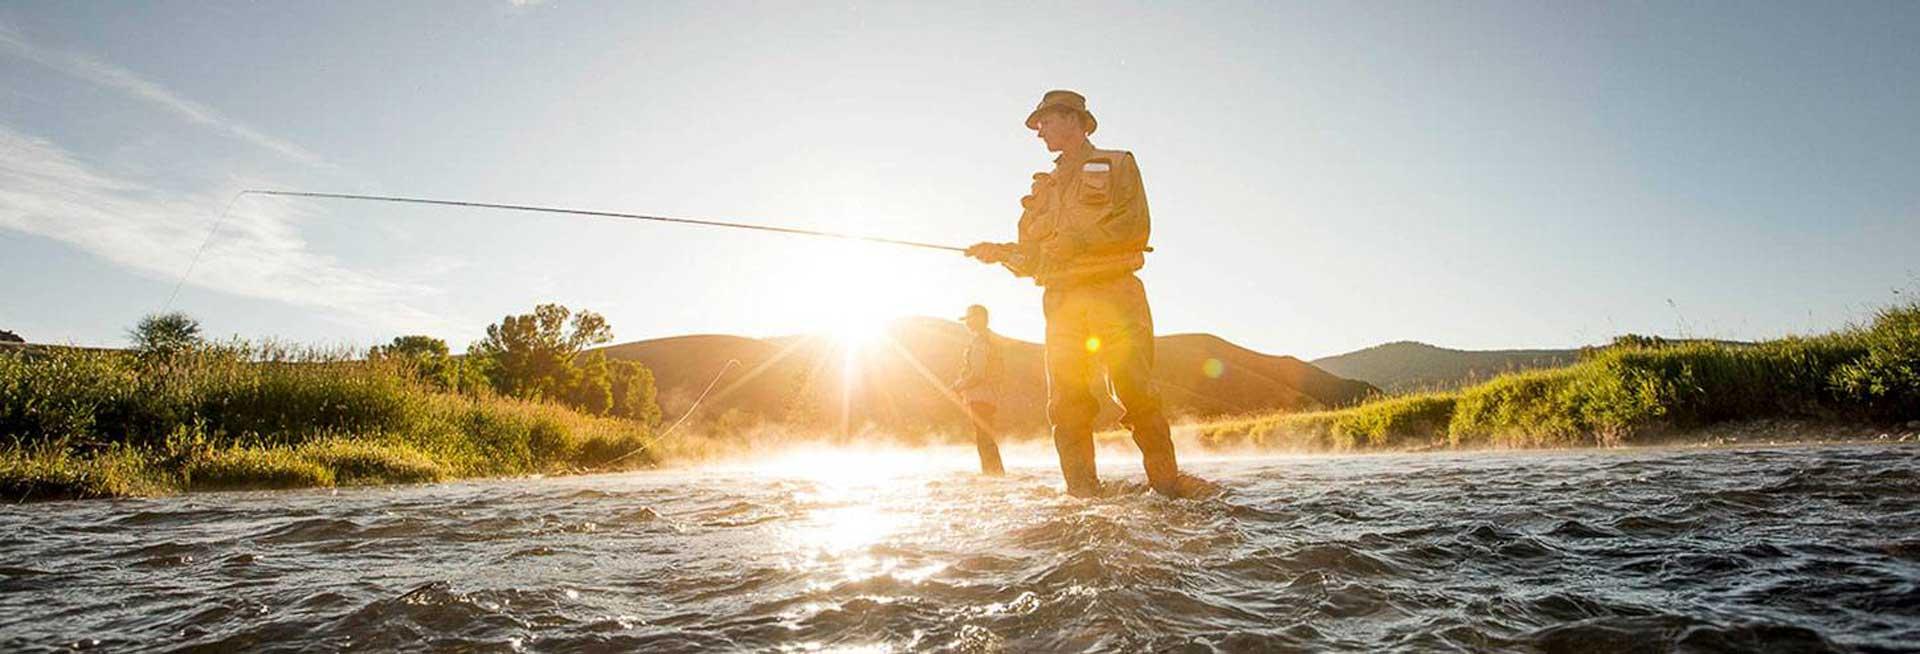 Men flyfishing on the river.